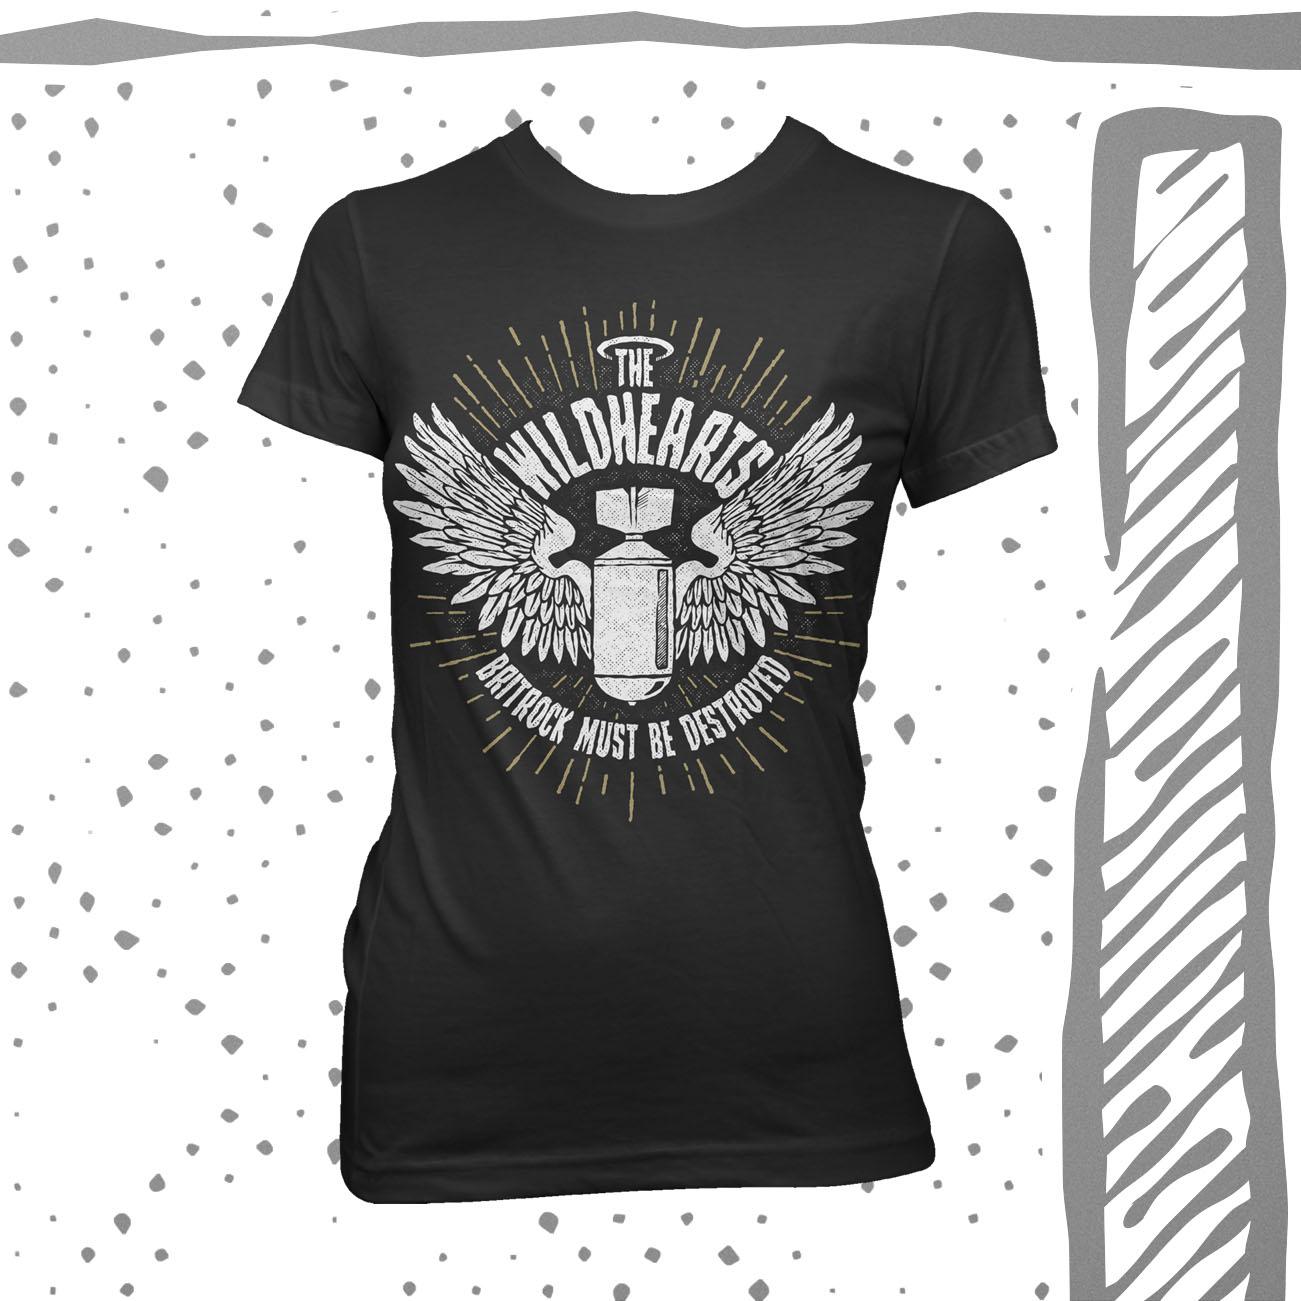 The Wildhearts - 'Bomb' Girls T-Shirt - The Wildhearts